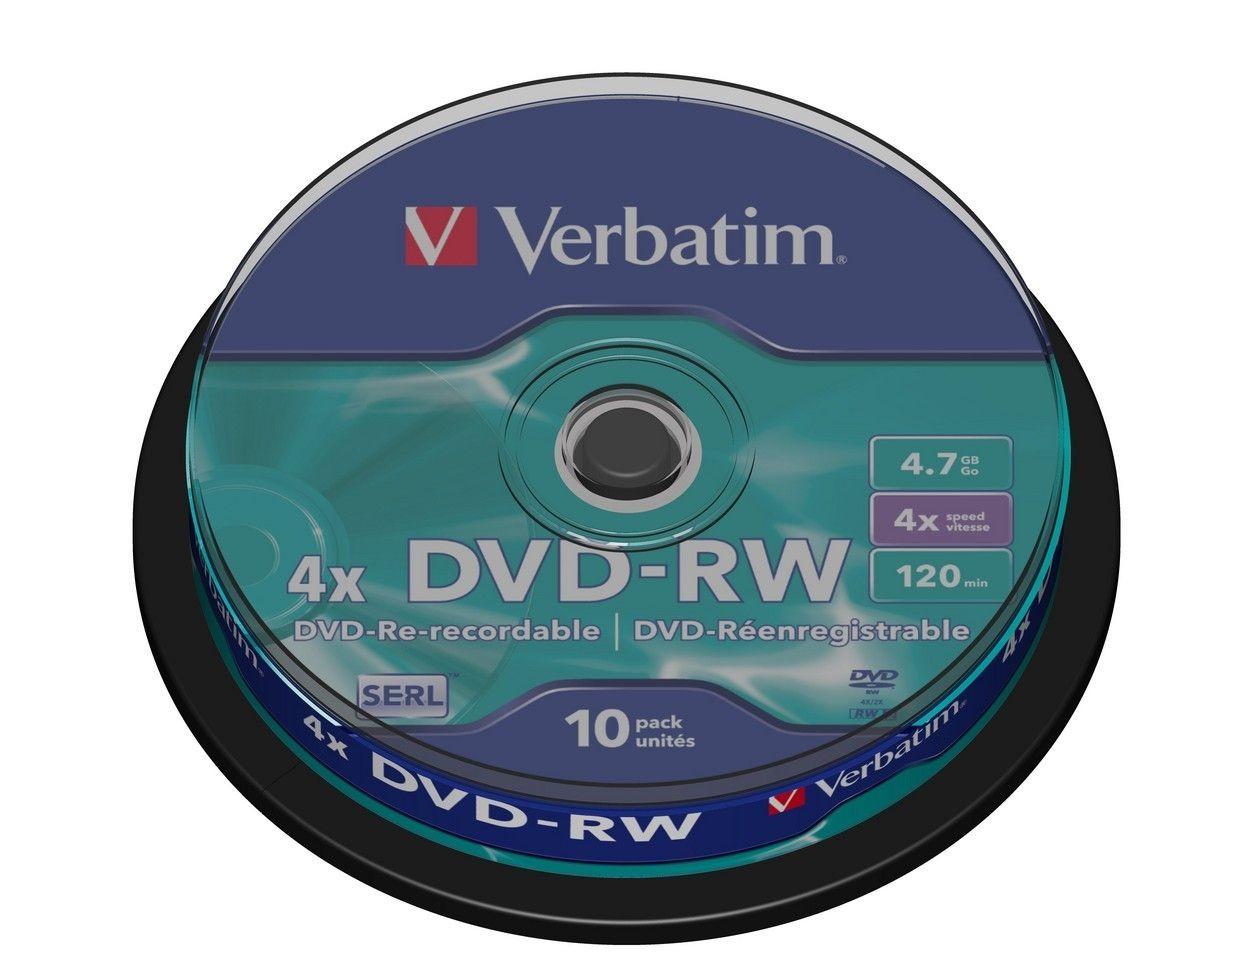 Verbatim DVD-RW 4,7GB x4 (cake box, 10szt)